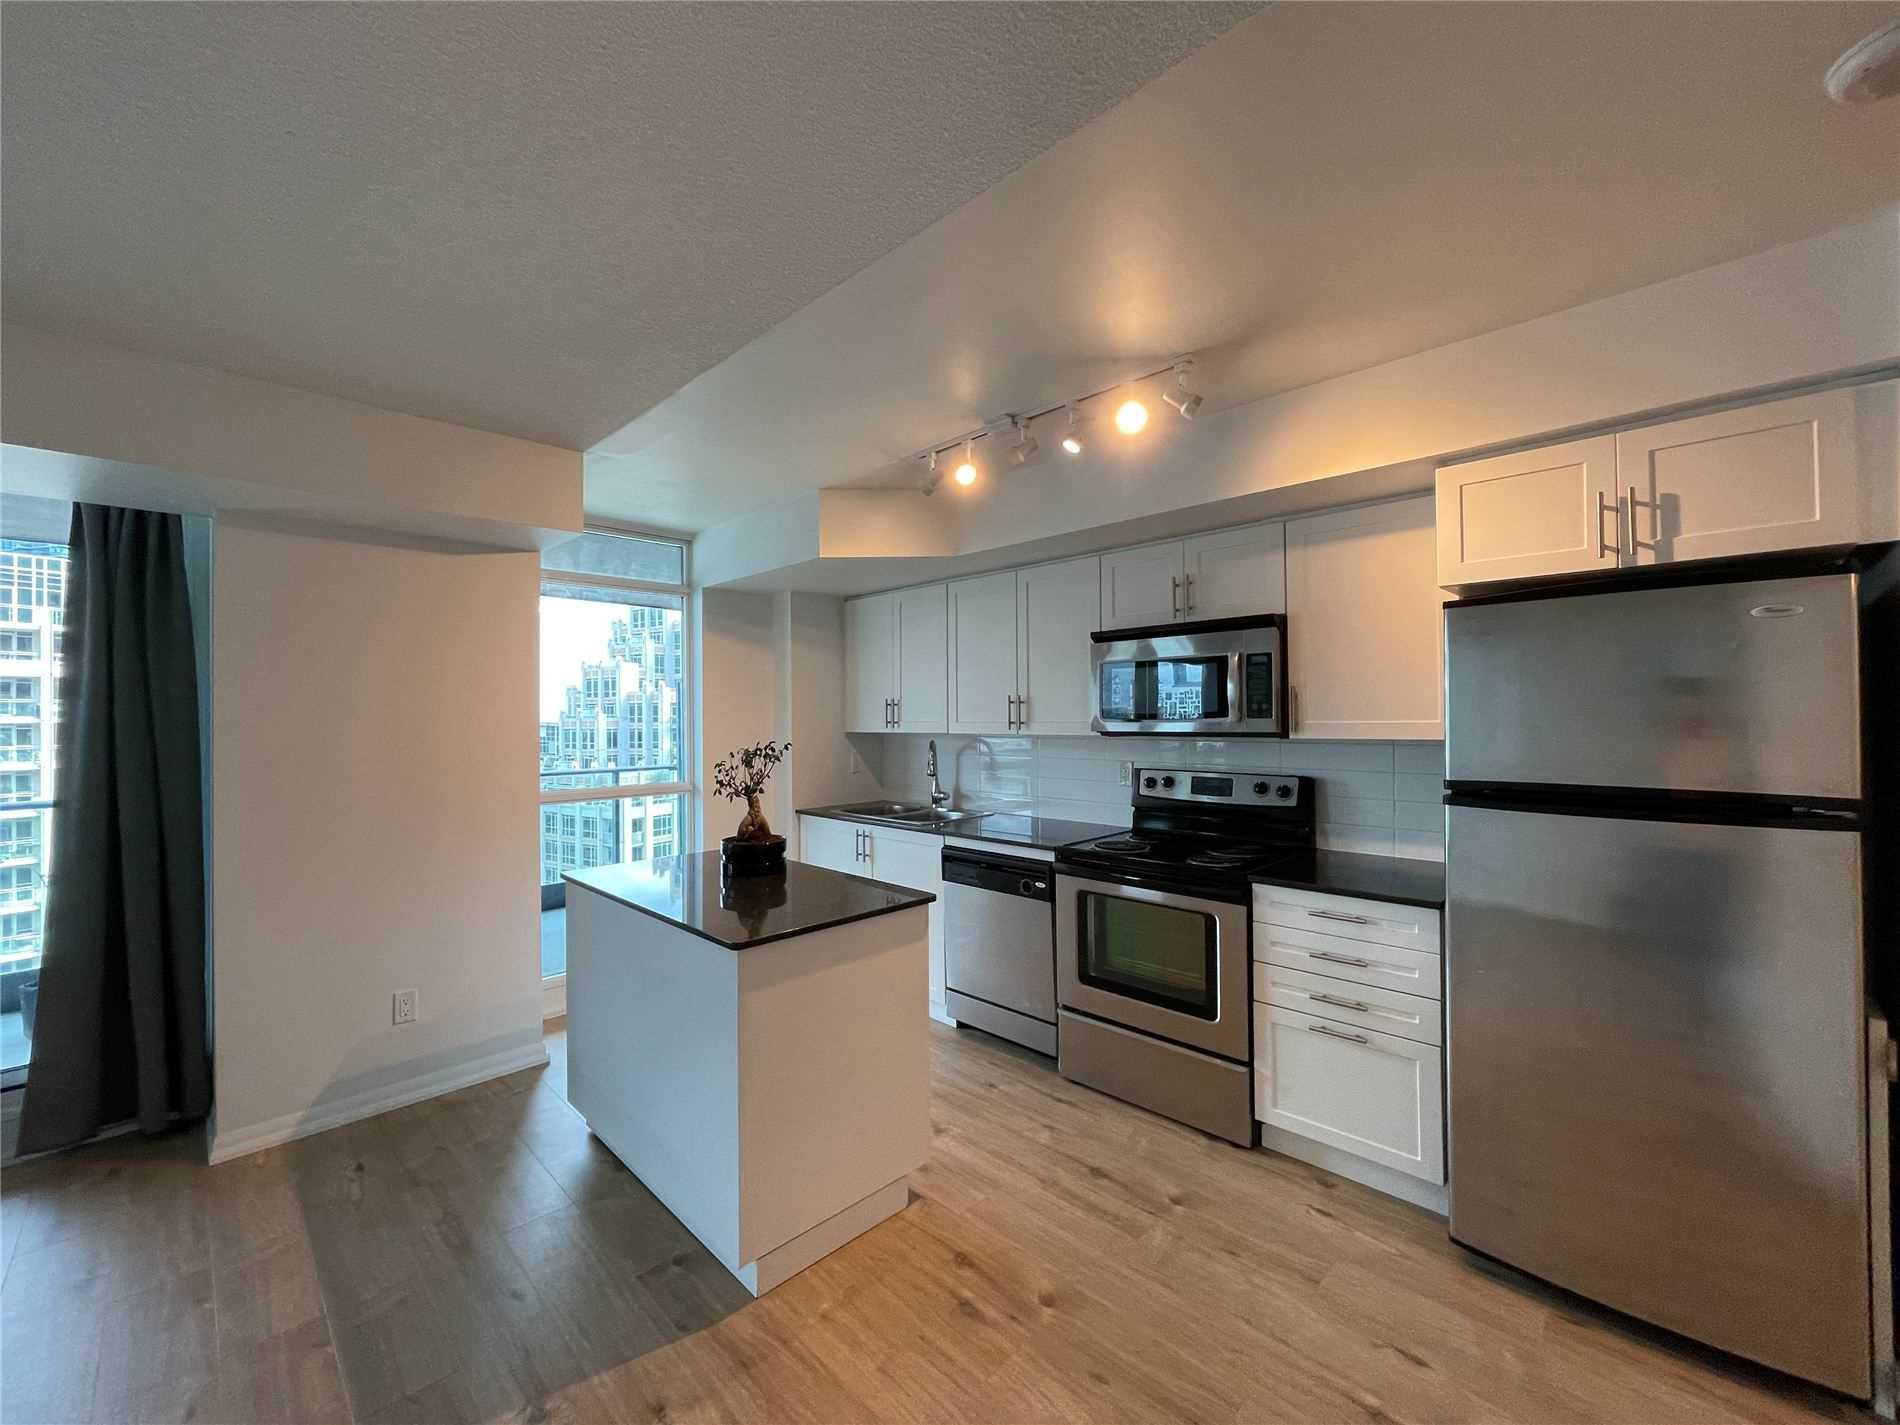 Condo Apt For Lease In Toronto , 2 Bedrooms Bedrooms, ,2 BathroomsBathrooms,Condo Apt,For Lease,1369,Fort York